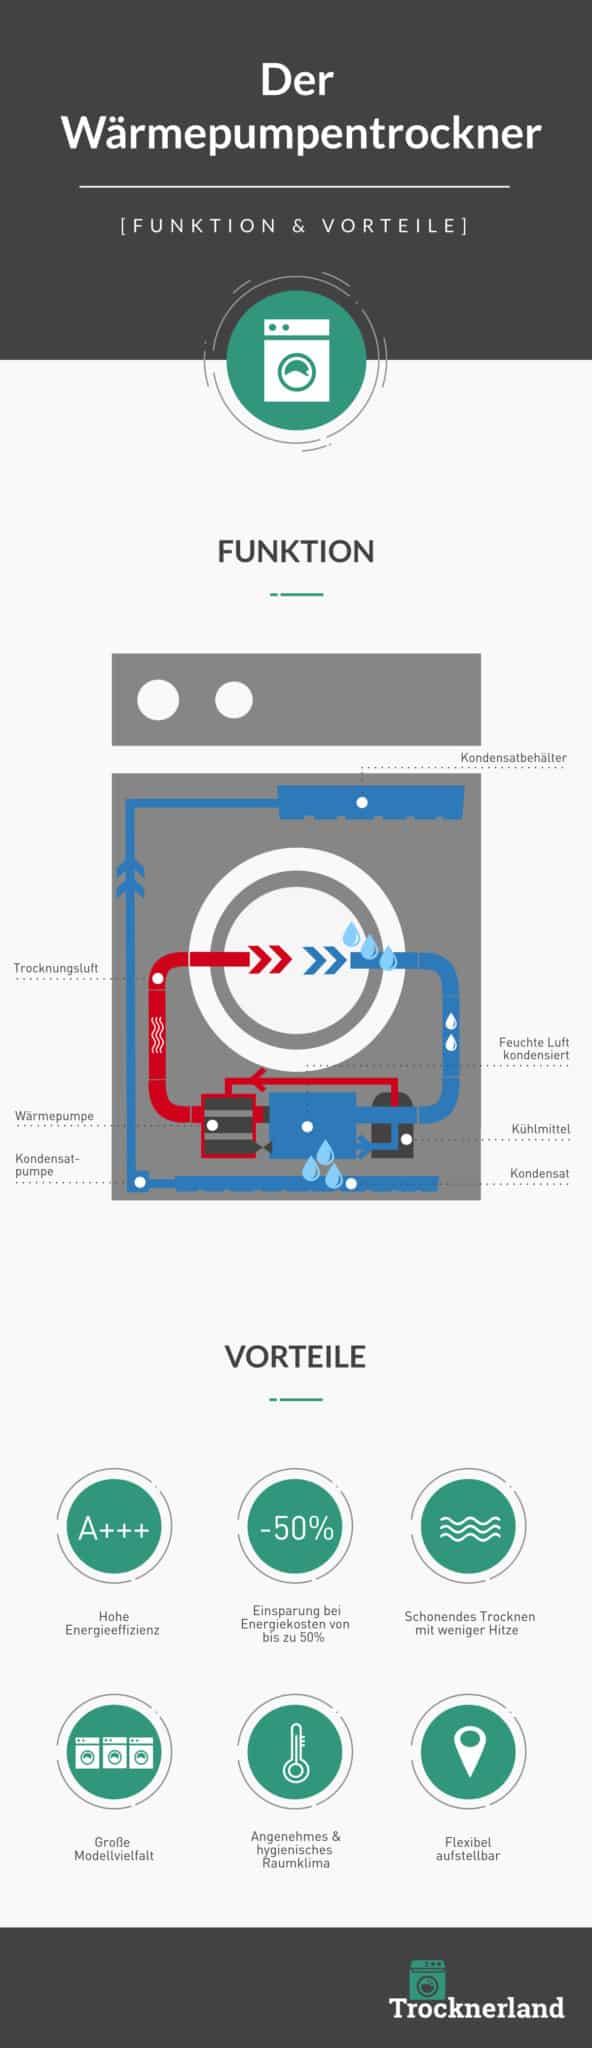 Wärmepumentrockner Funktion & Vorteile Infografik